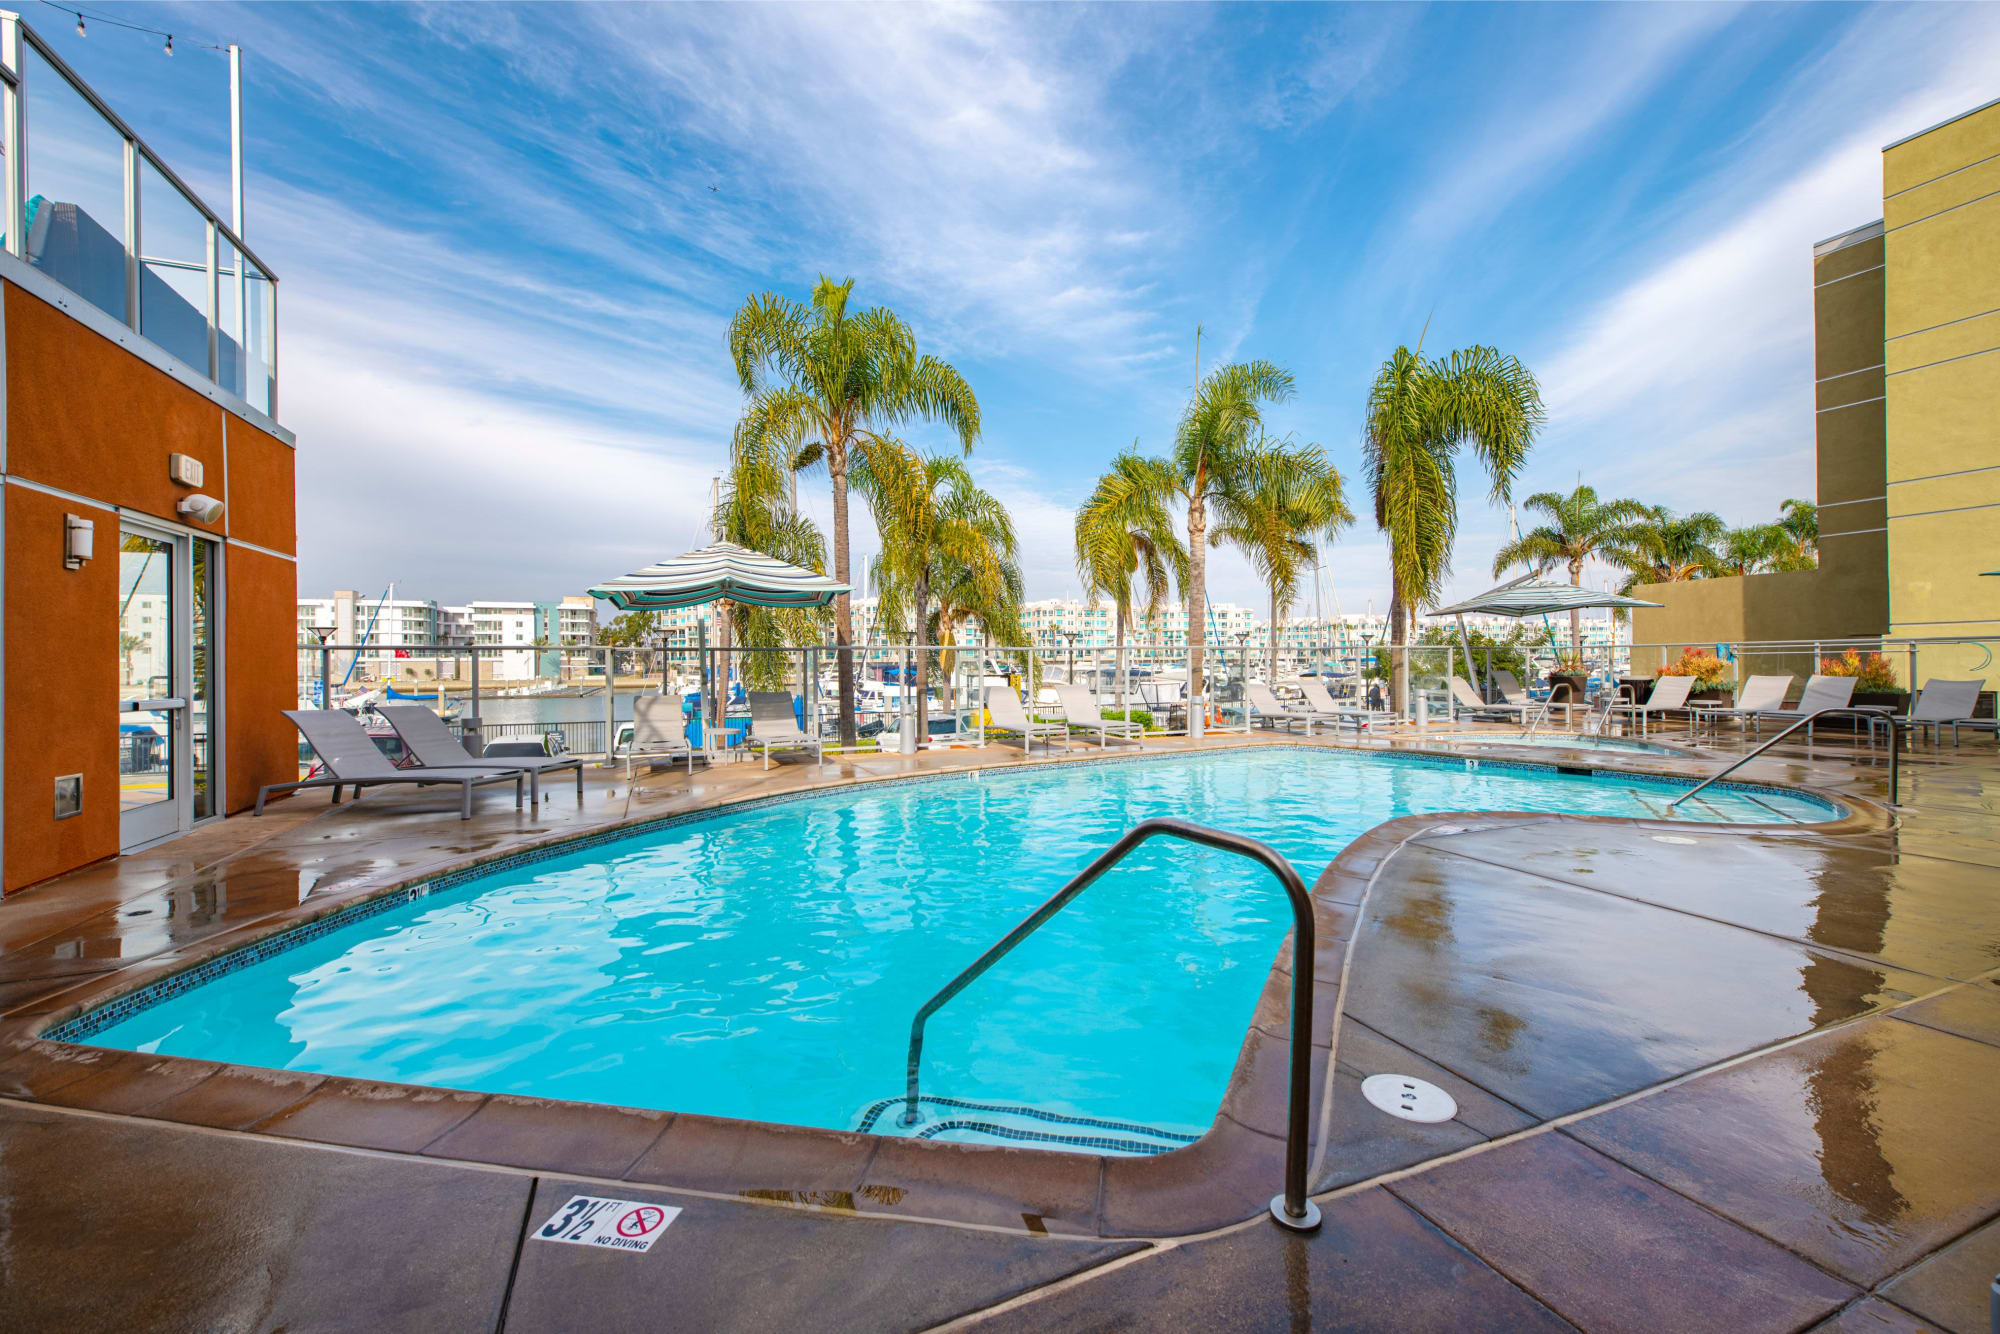 Beautiful, sparkling blue swimming pool at Harborside Marina Bay Apartments in Marina del Rey, California